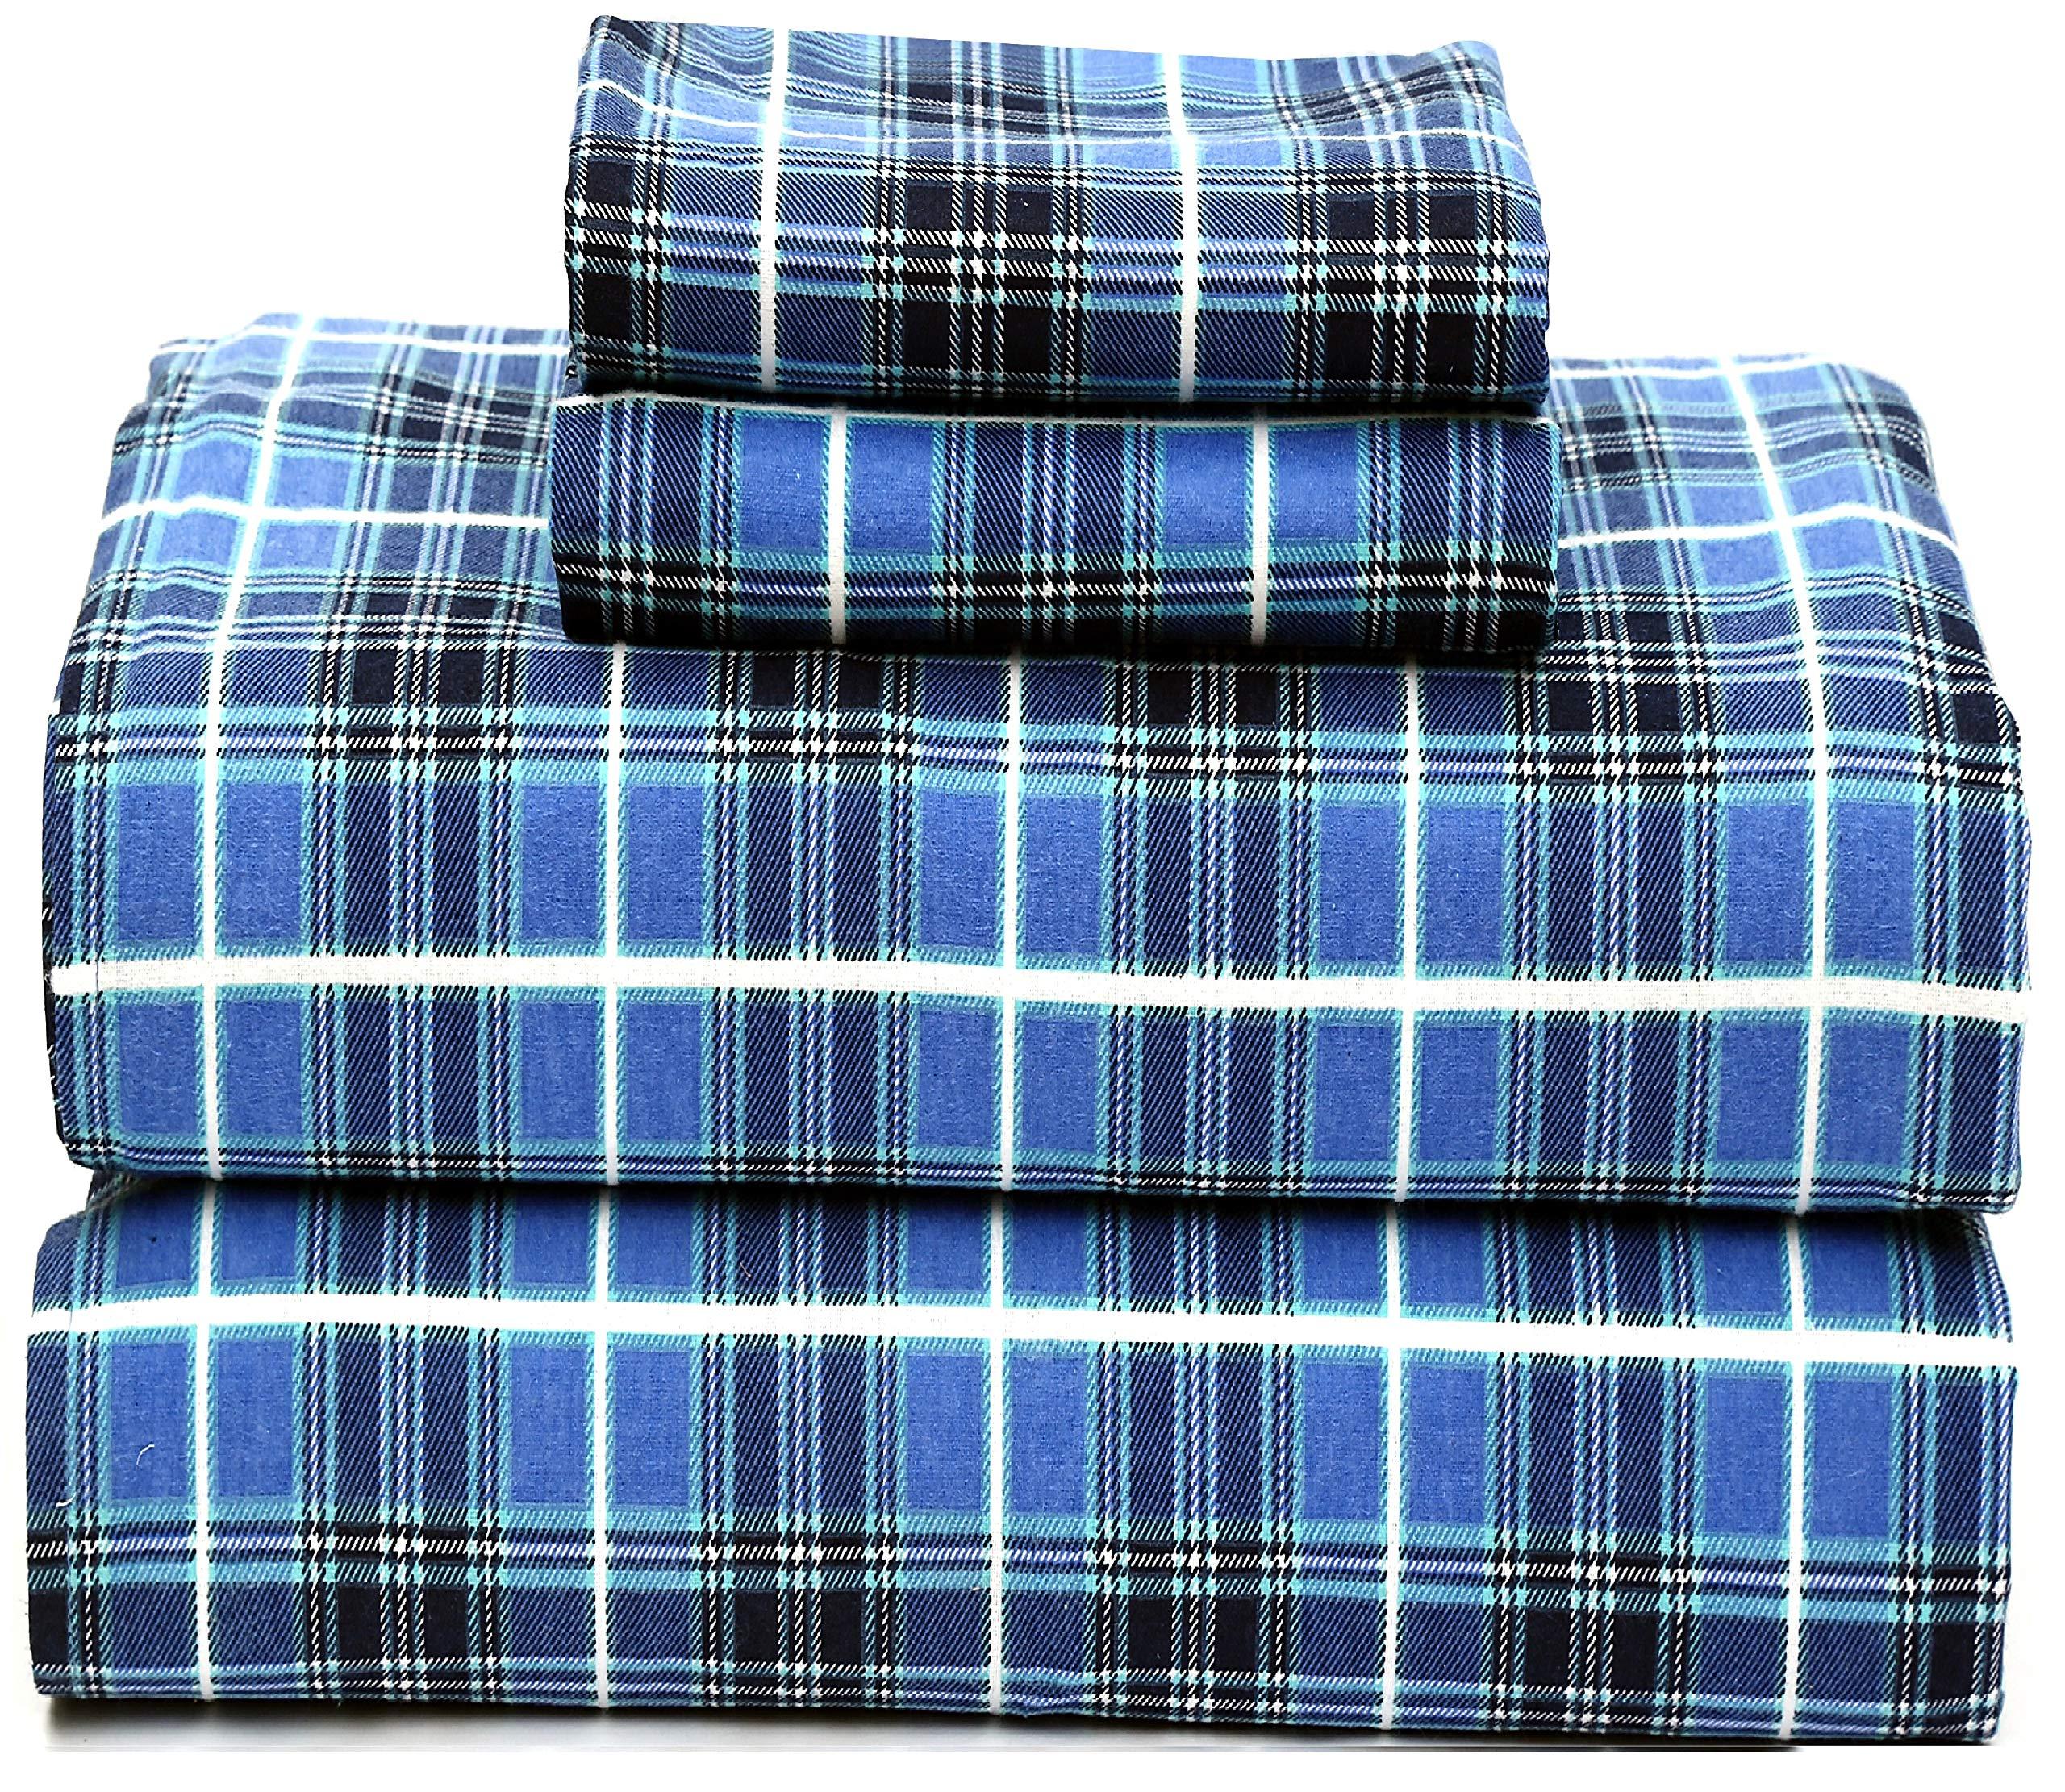 Ruvanti Cotton Piece Flannel Sheets